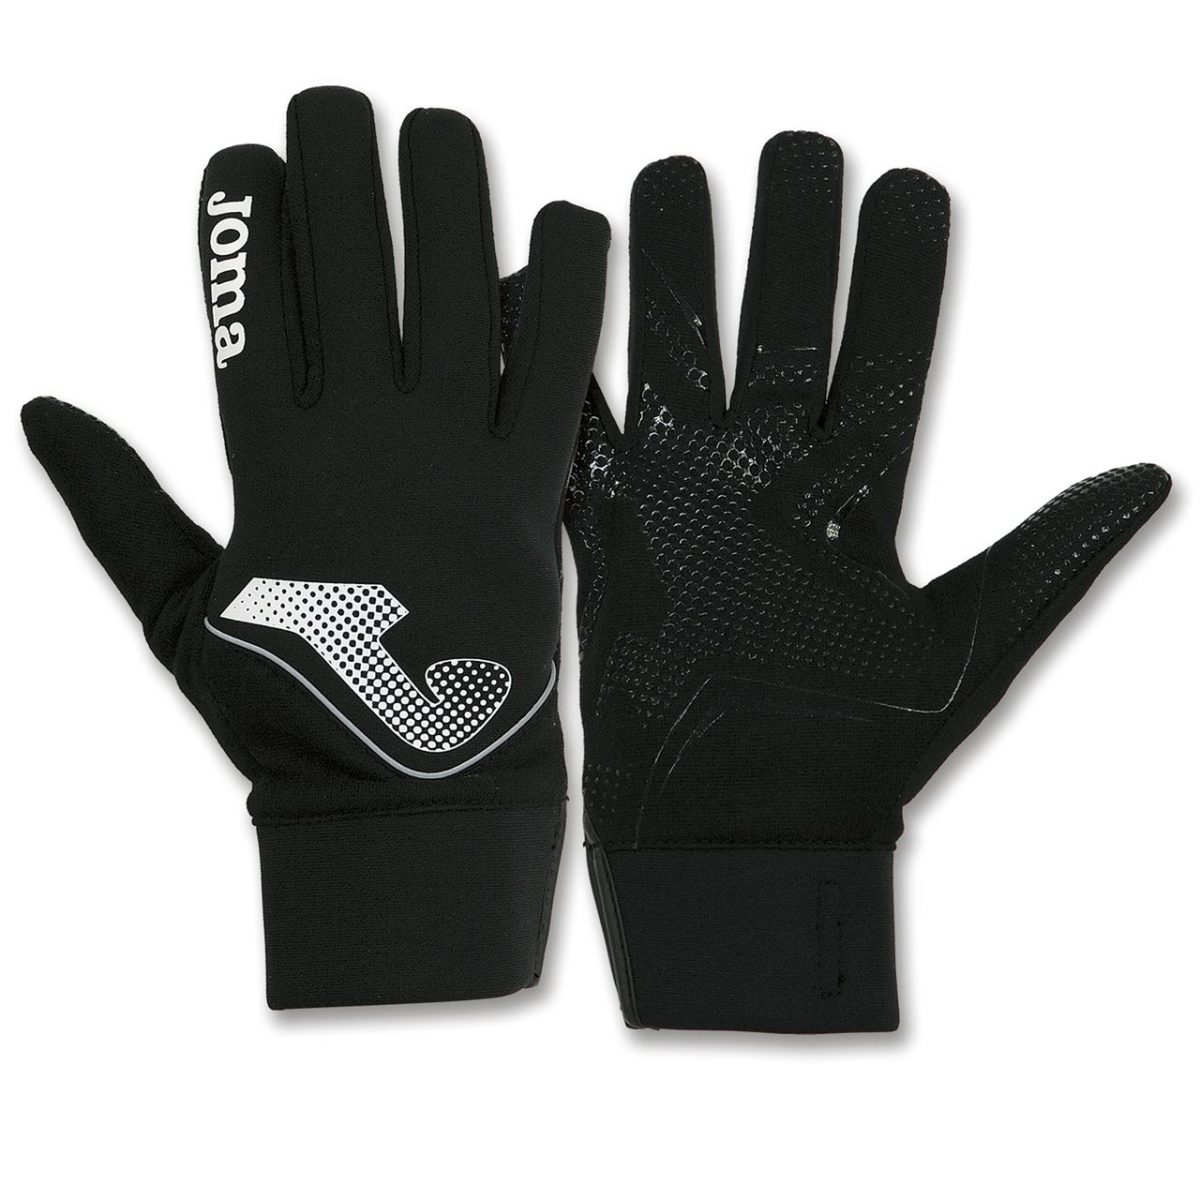 Spreyton FC Players Gloves - Black